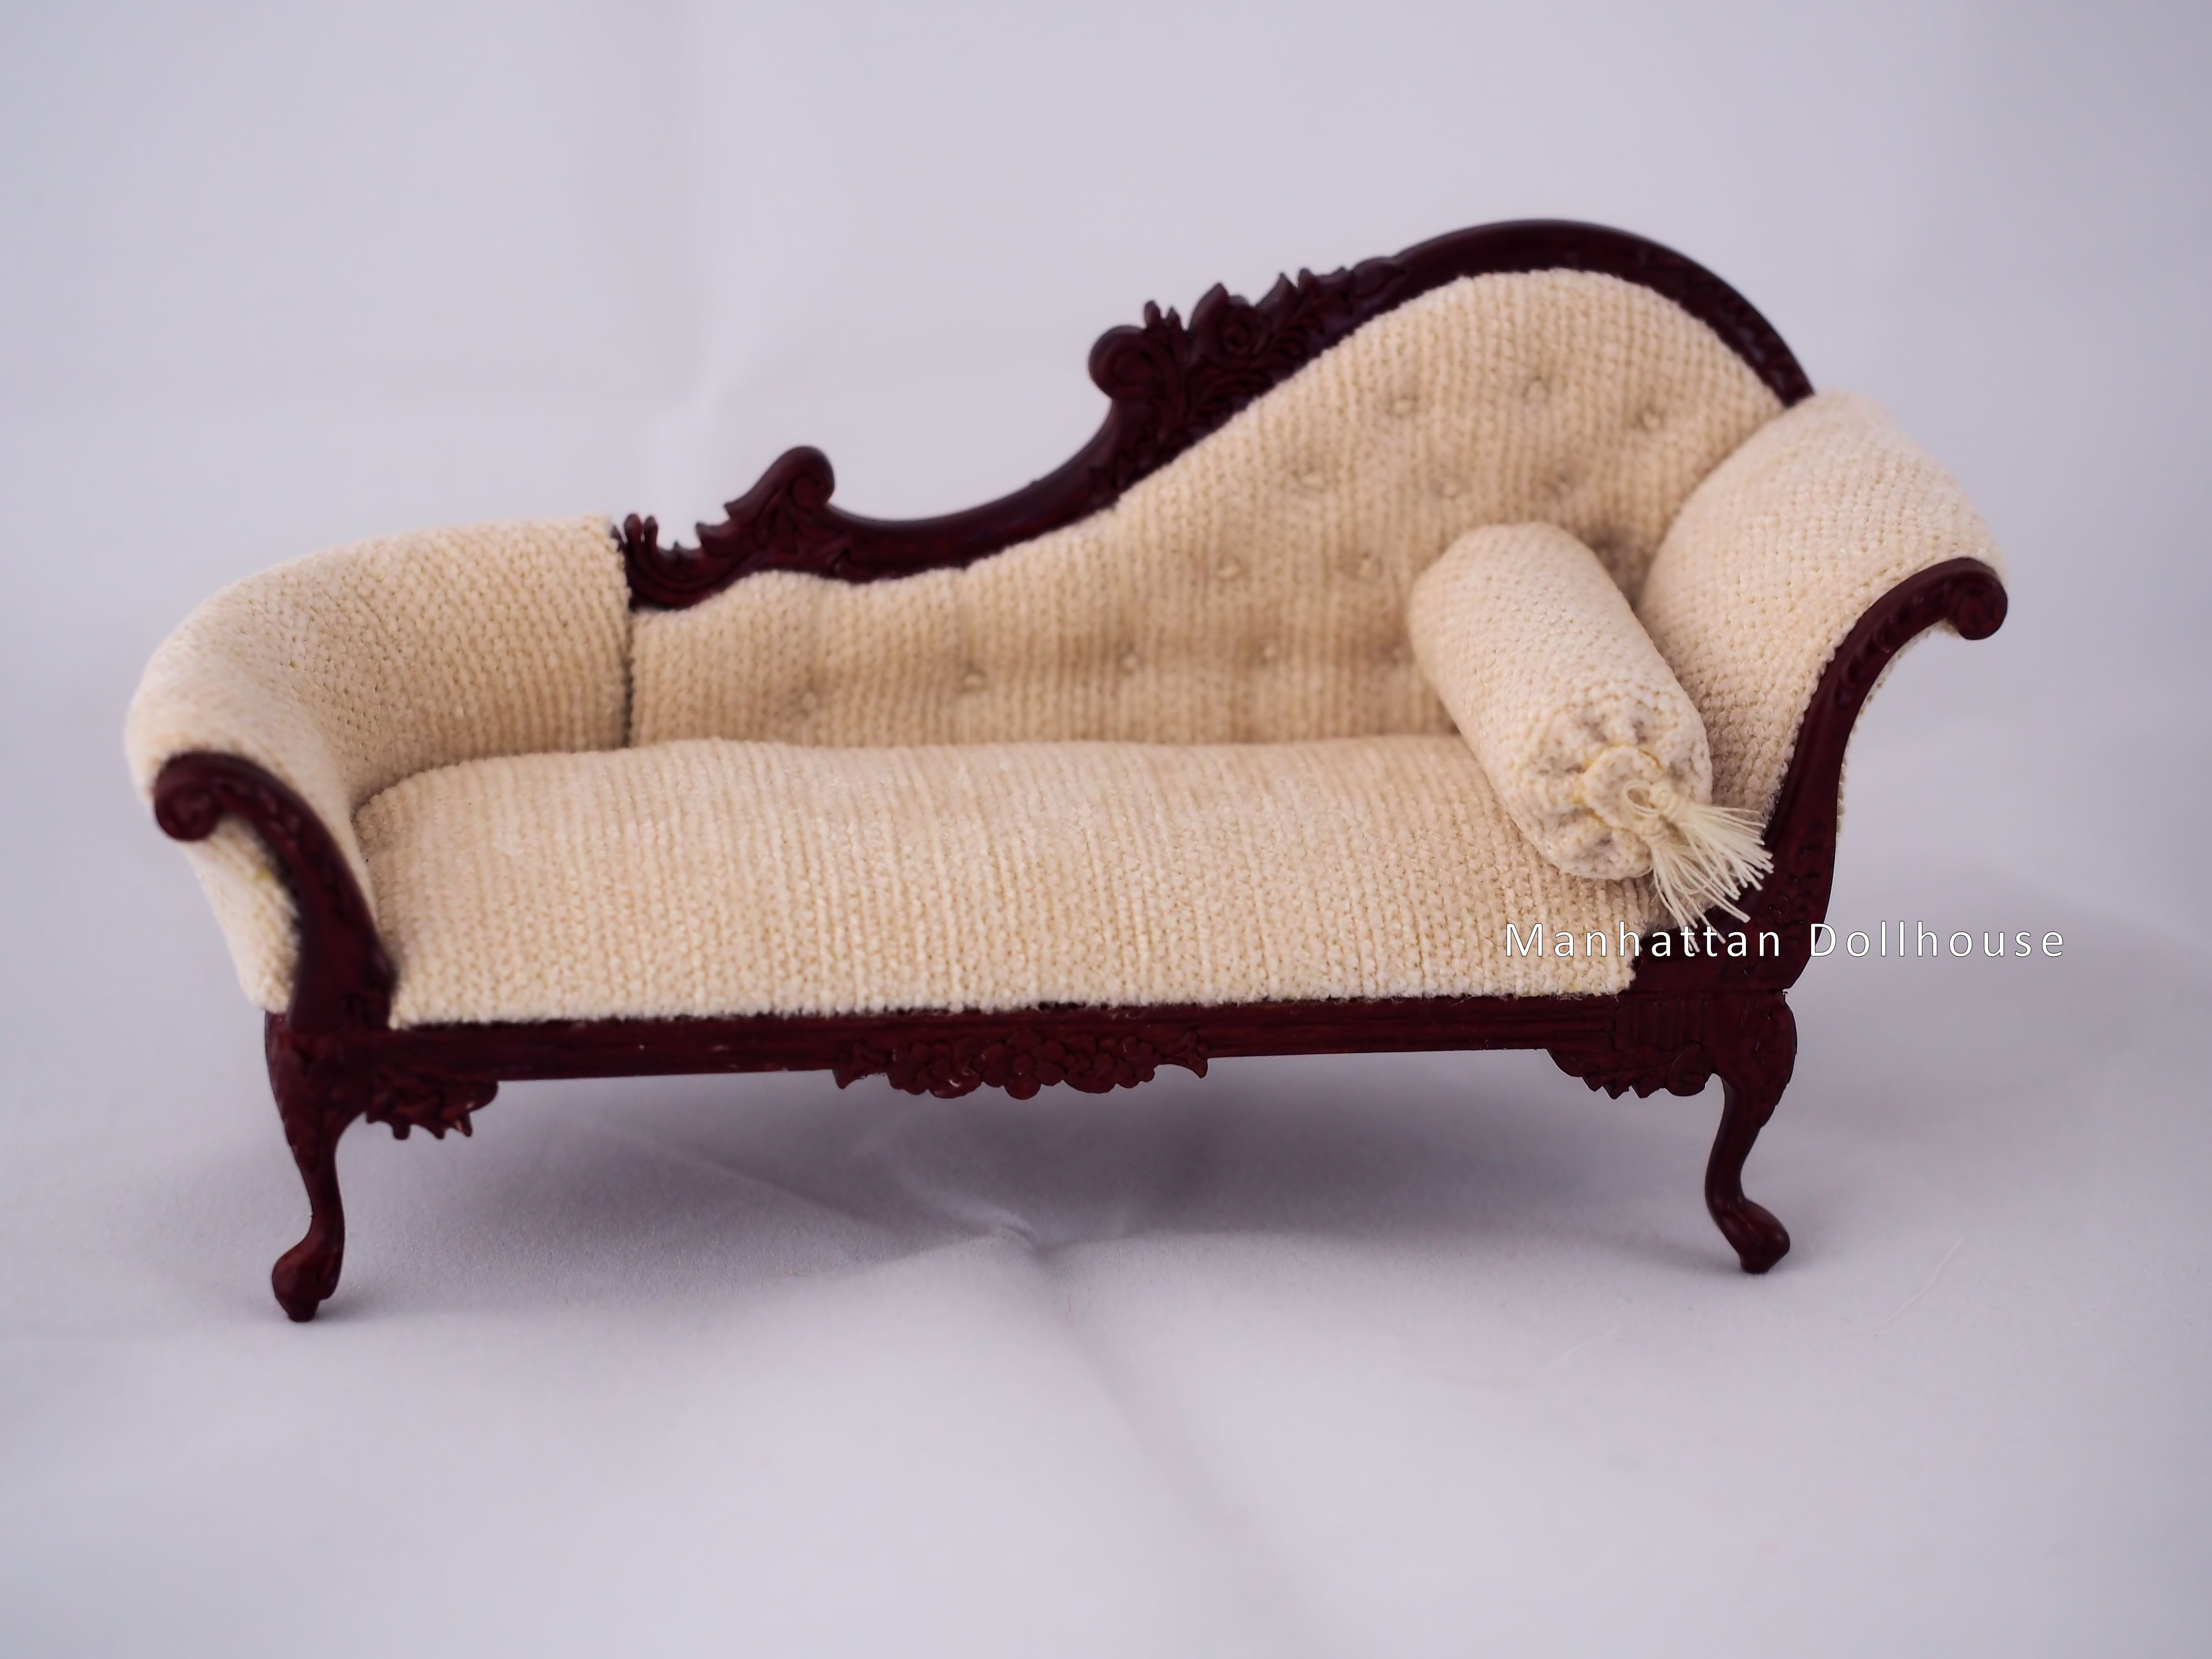 miniature sofa bed metal action cheap dollhouse set home the honoroak